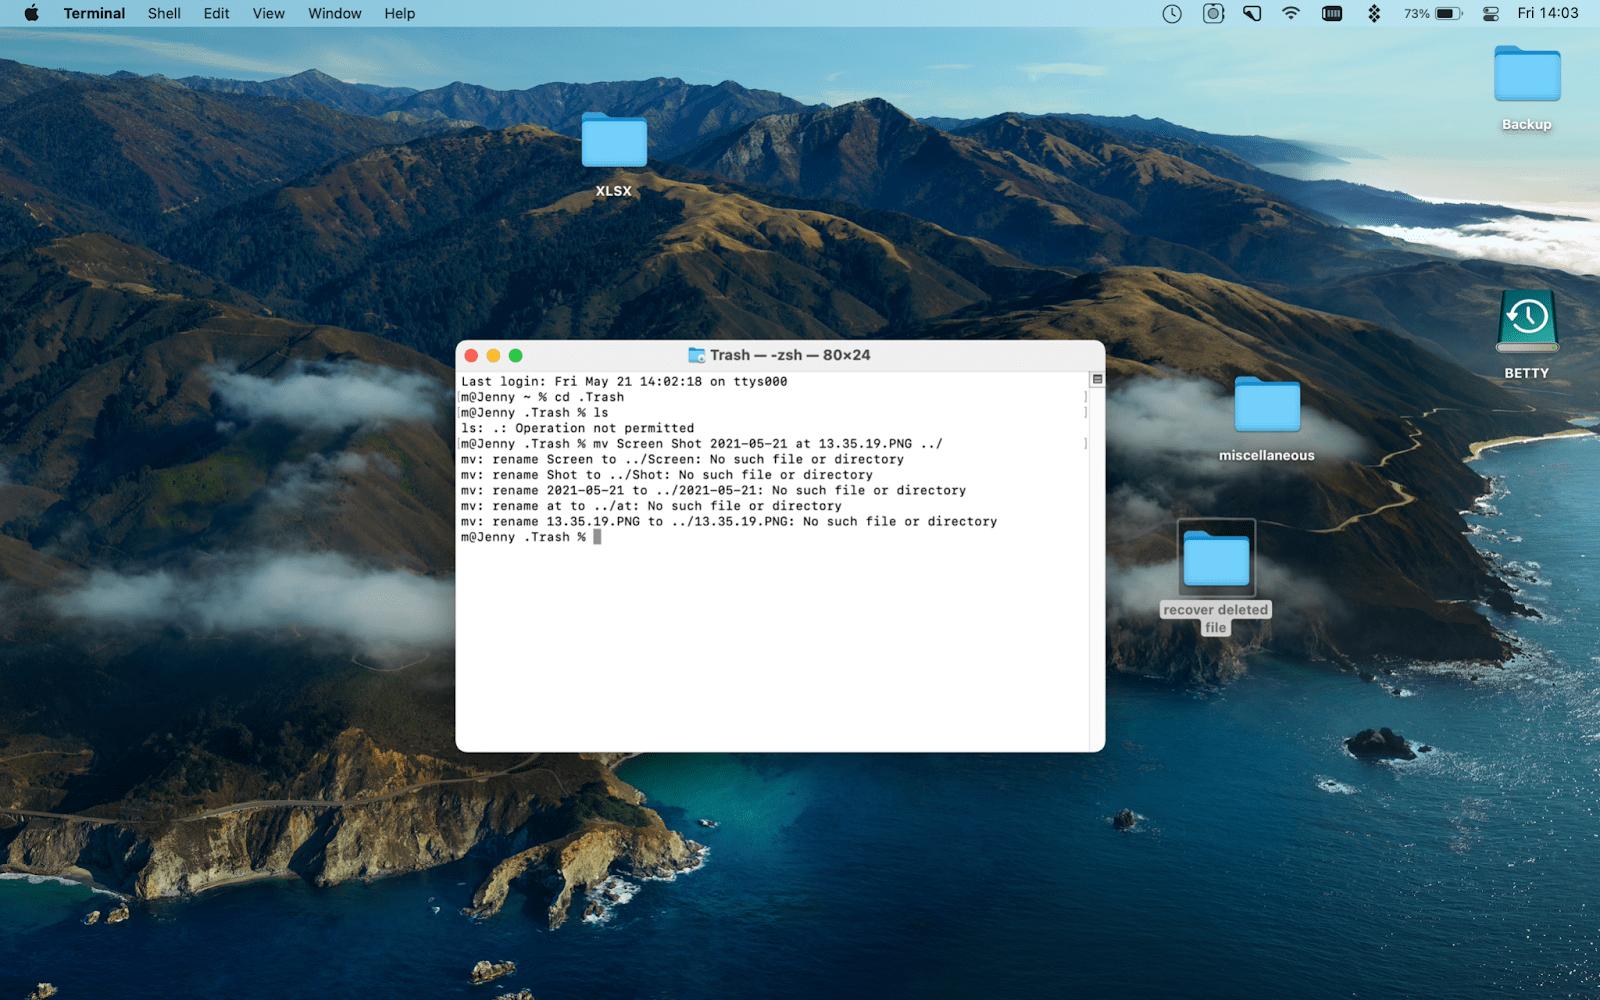 recovery files via terminal